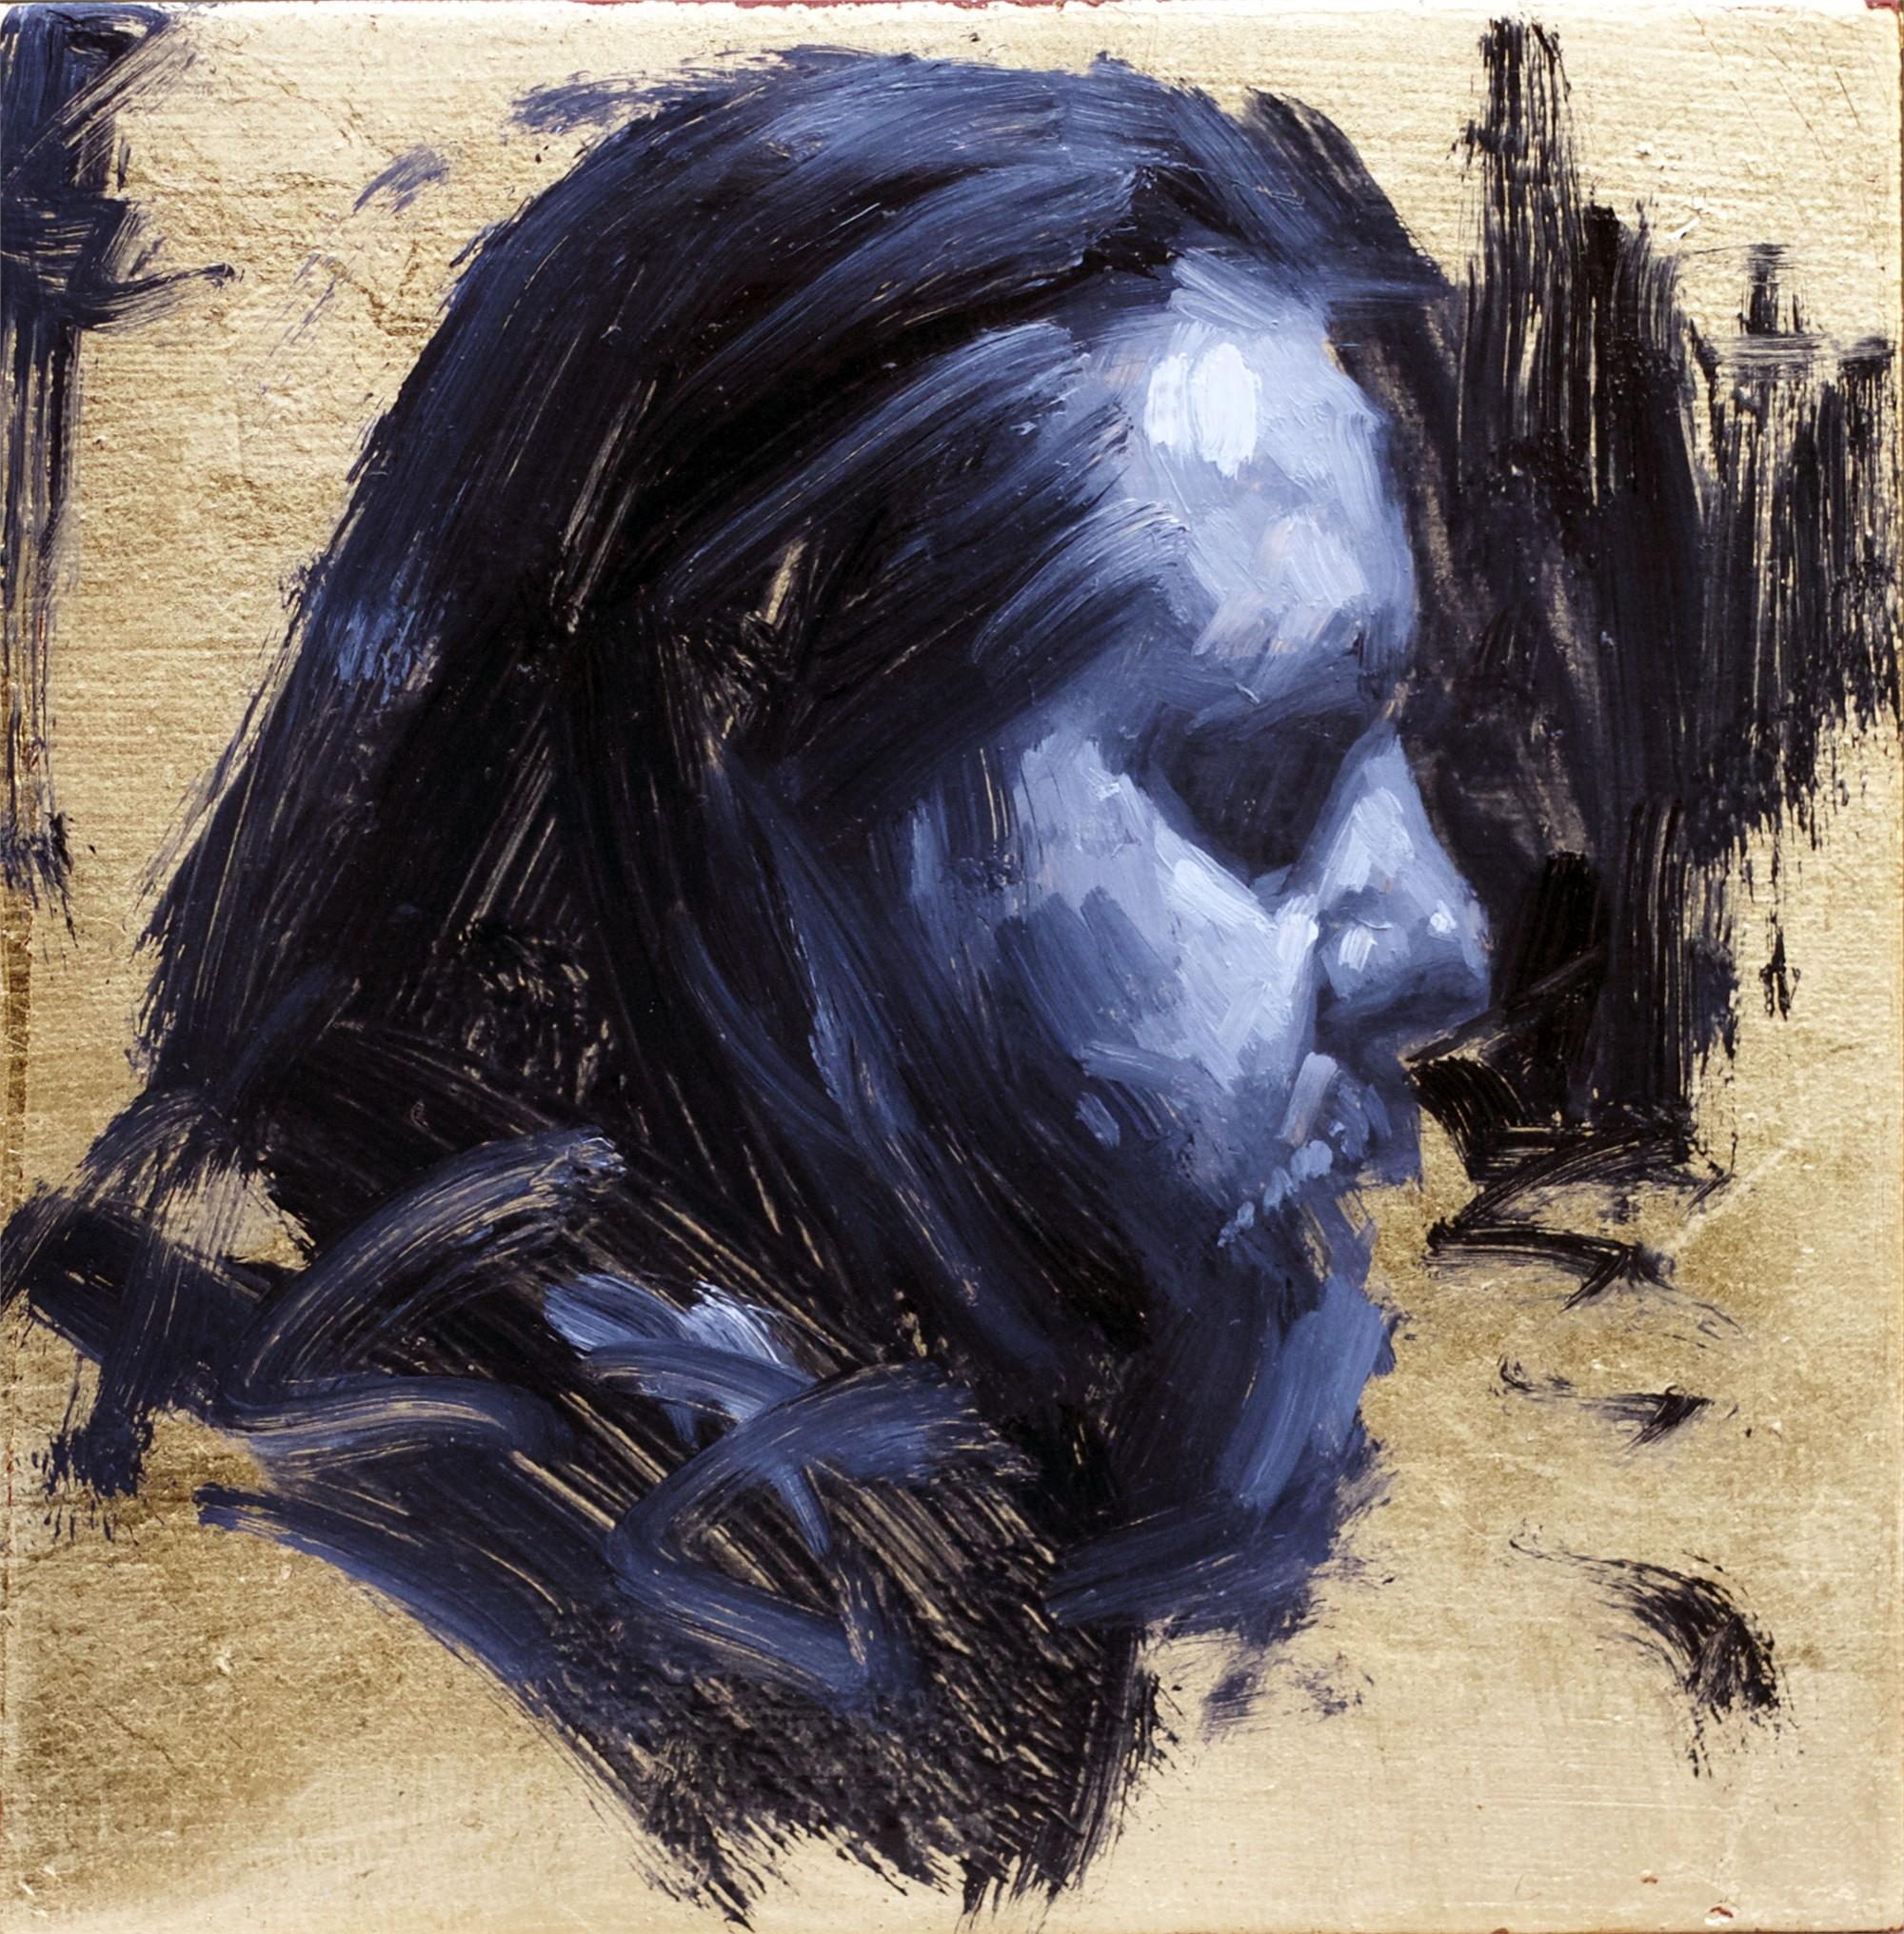 Tom by John Wentz